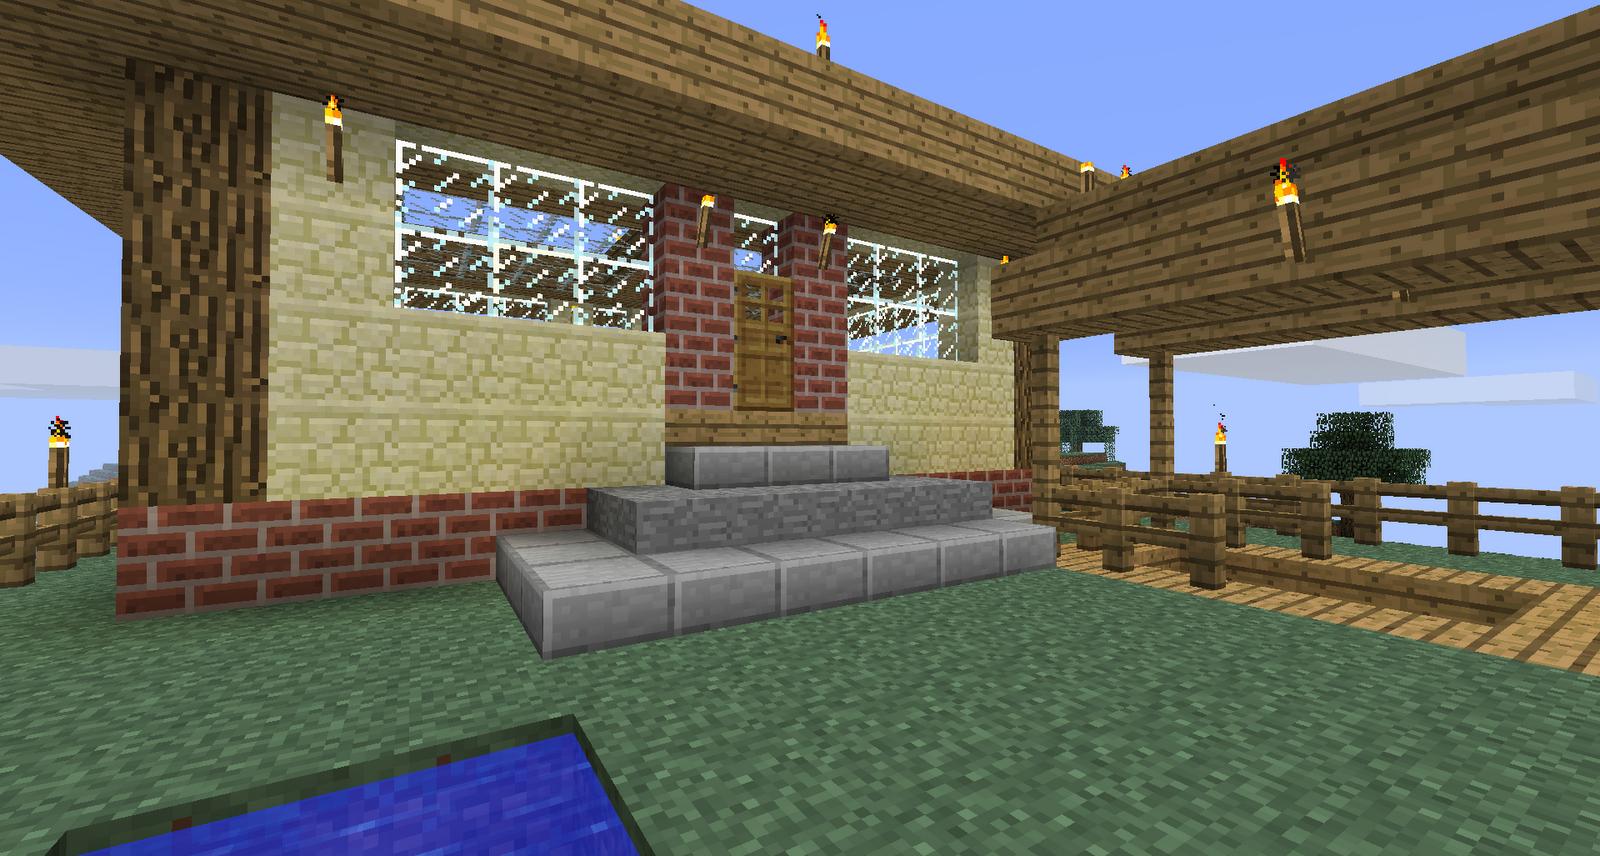 Small minecraft house ideas inside minecraft xbox 360 village seed